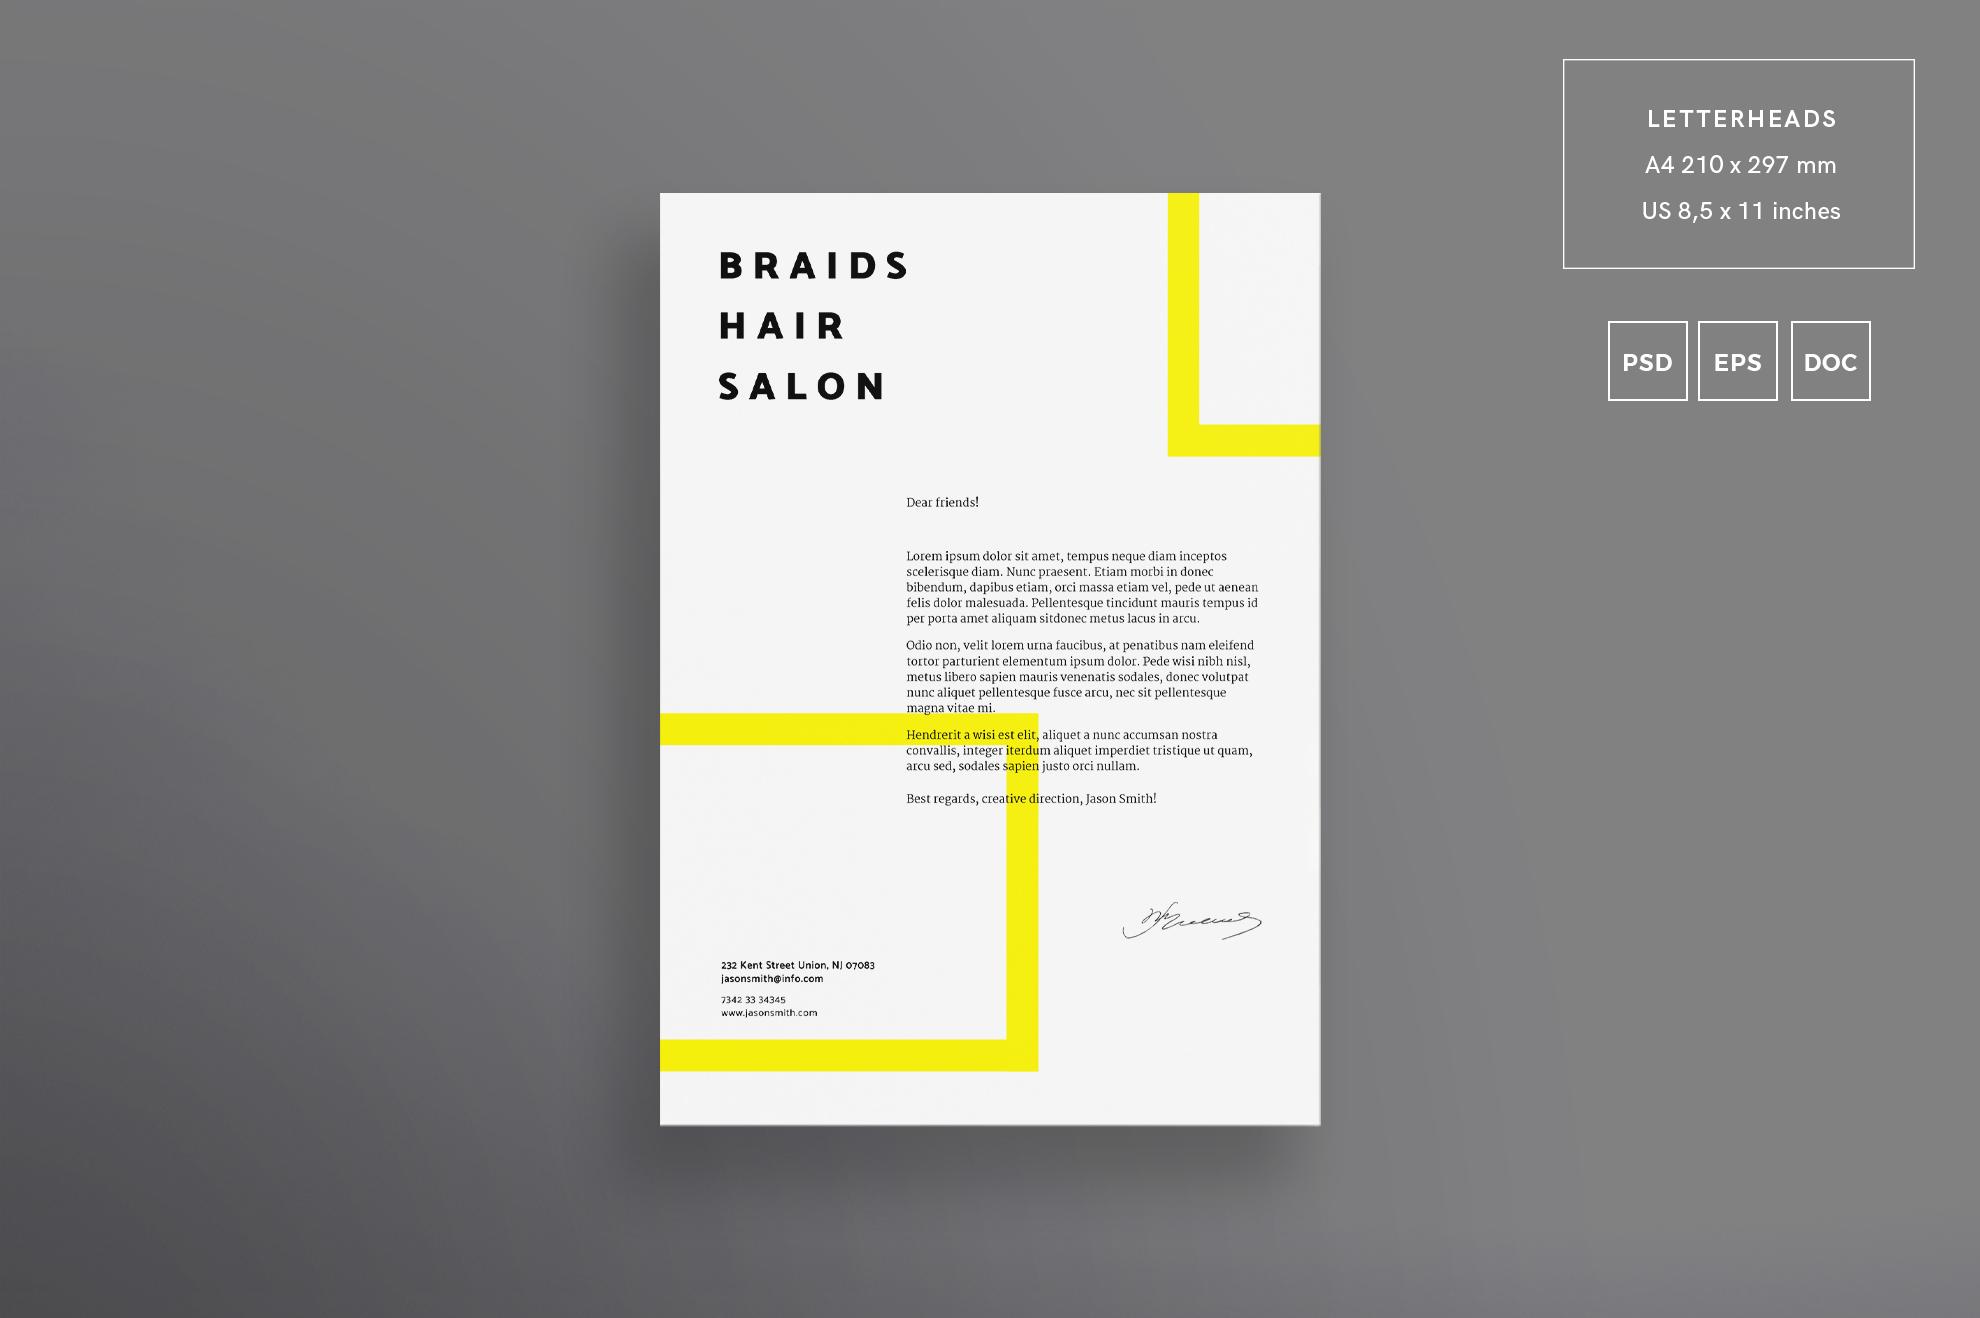 Hair Salon Barbershop Design Templates Bundle example image 4